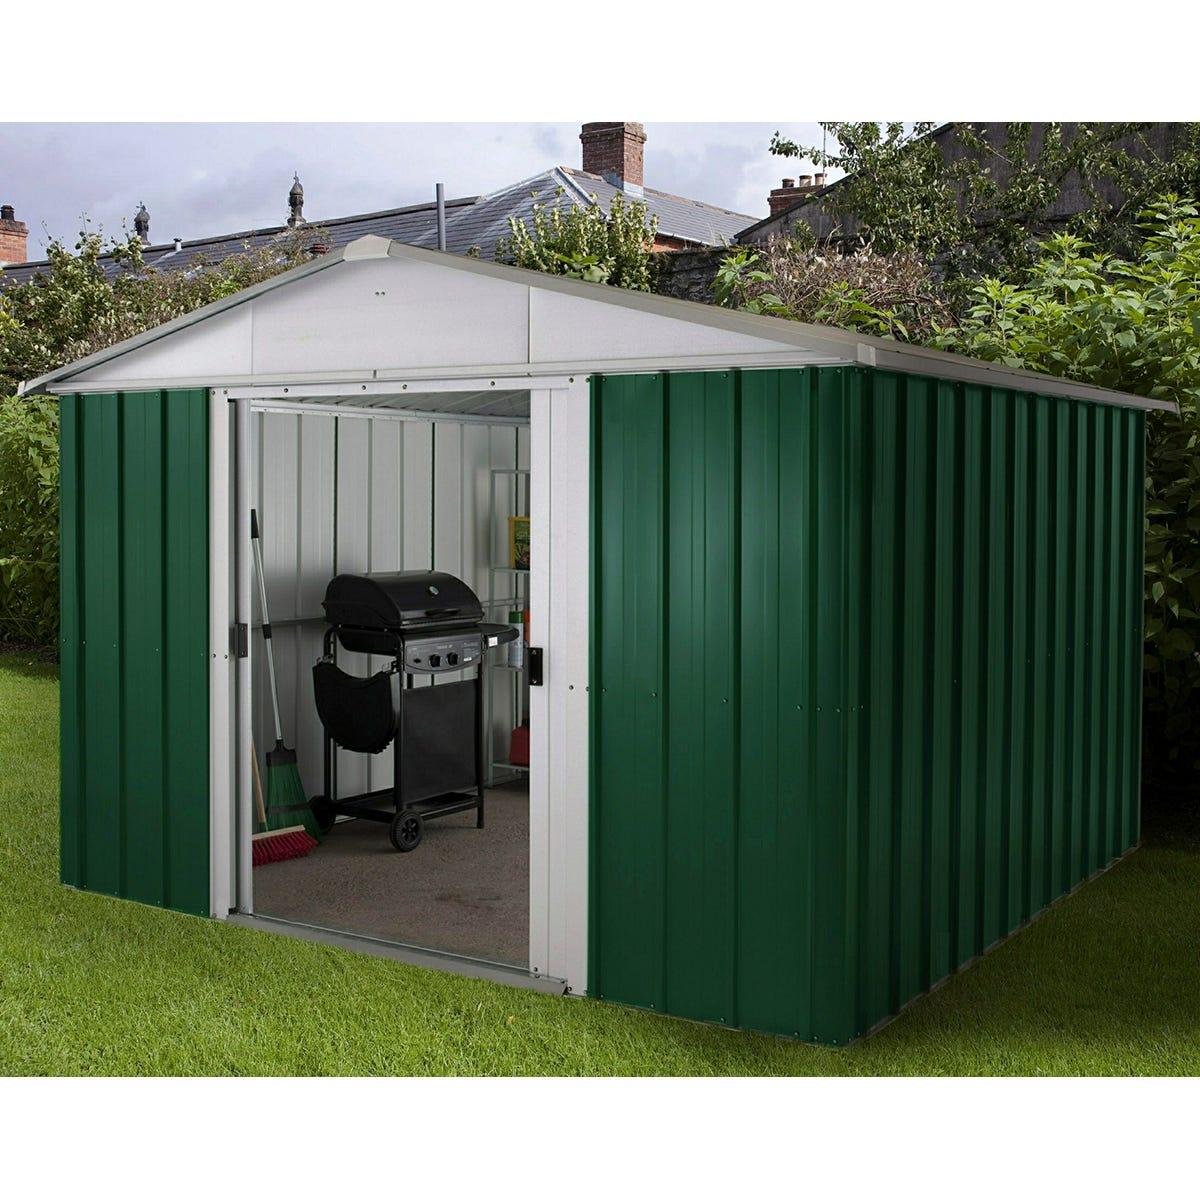 Yardmaster Emerald No Floor Metal Apex Shed 10 x 13ft